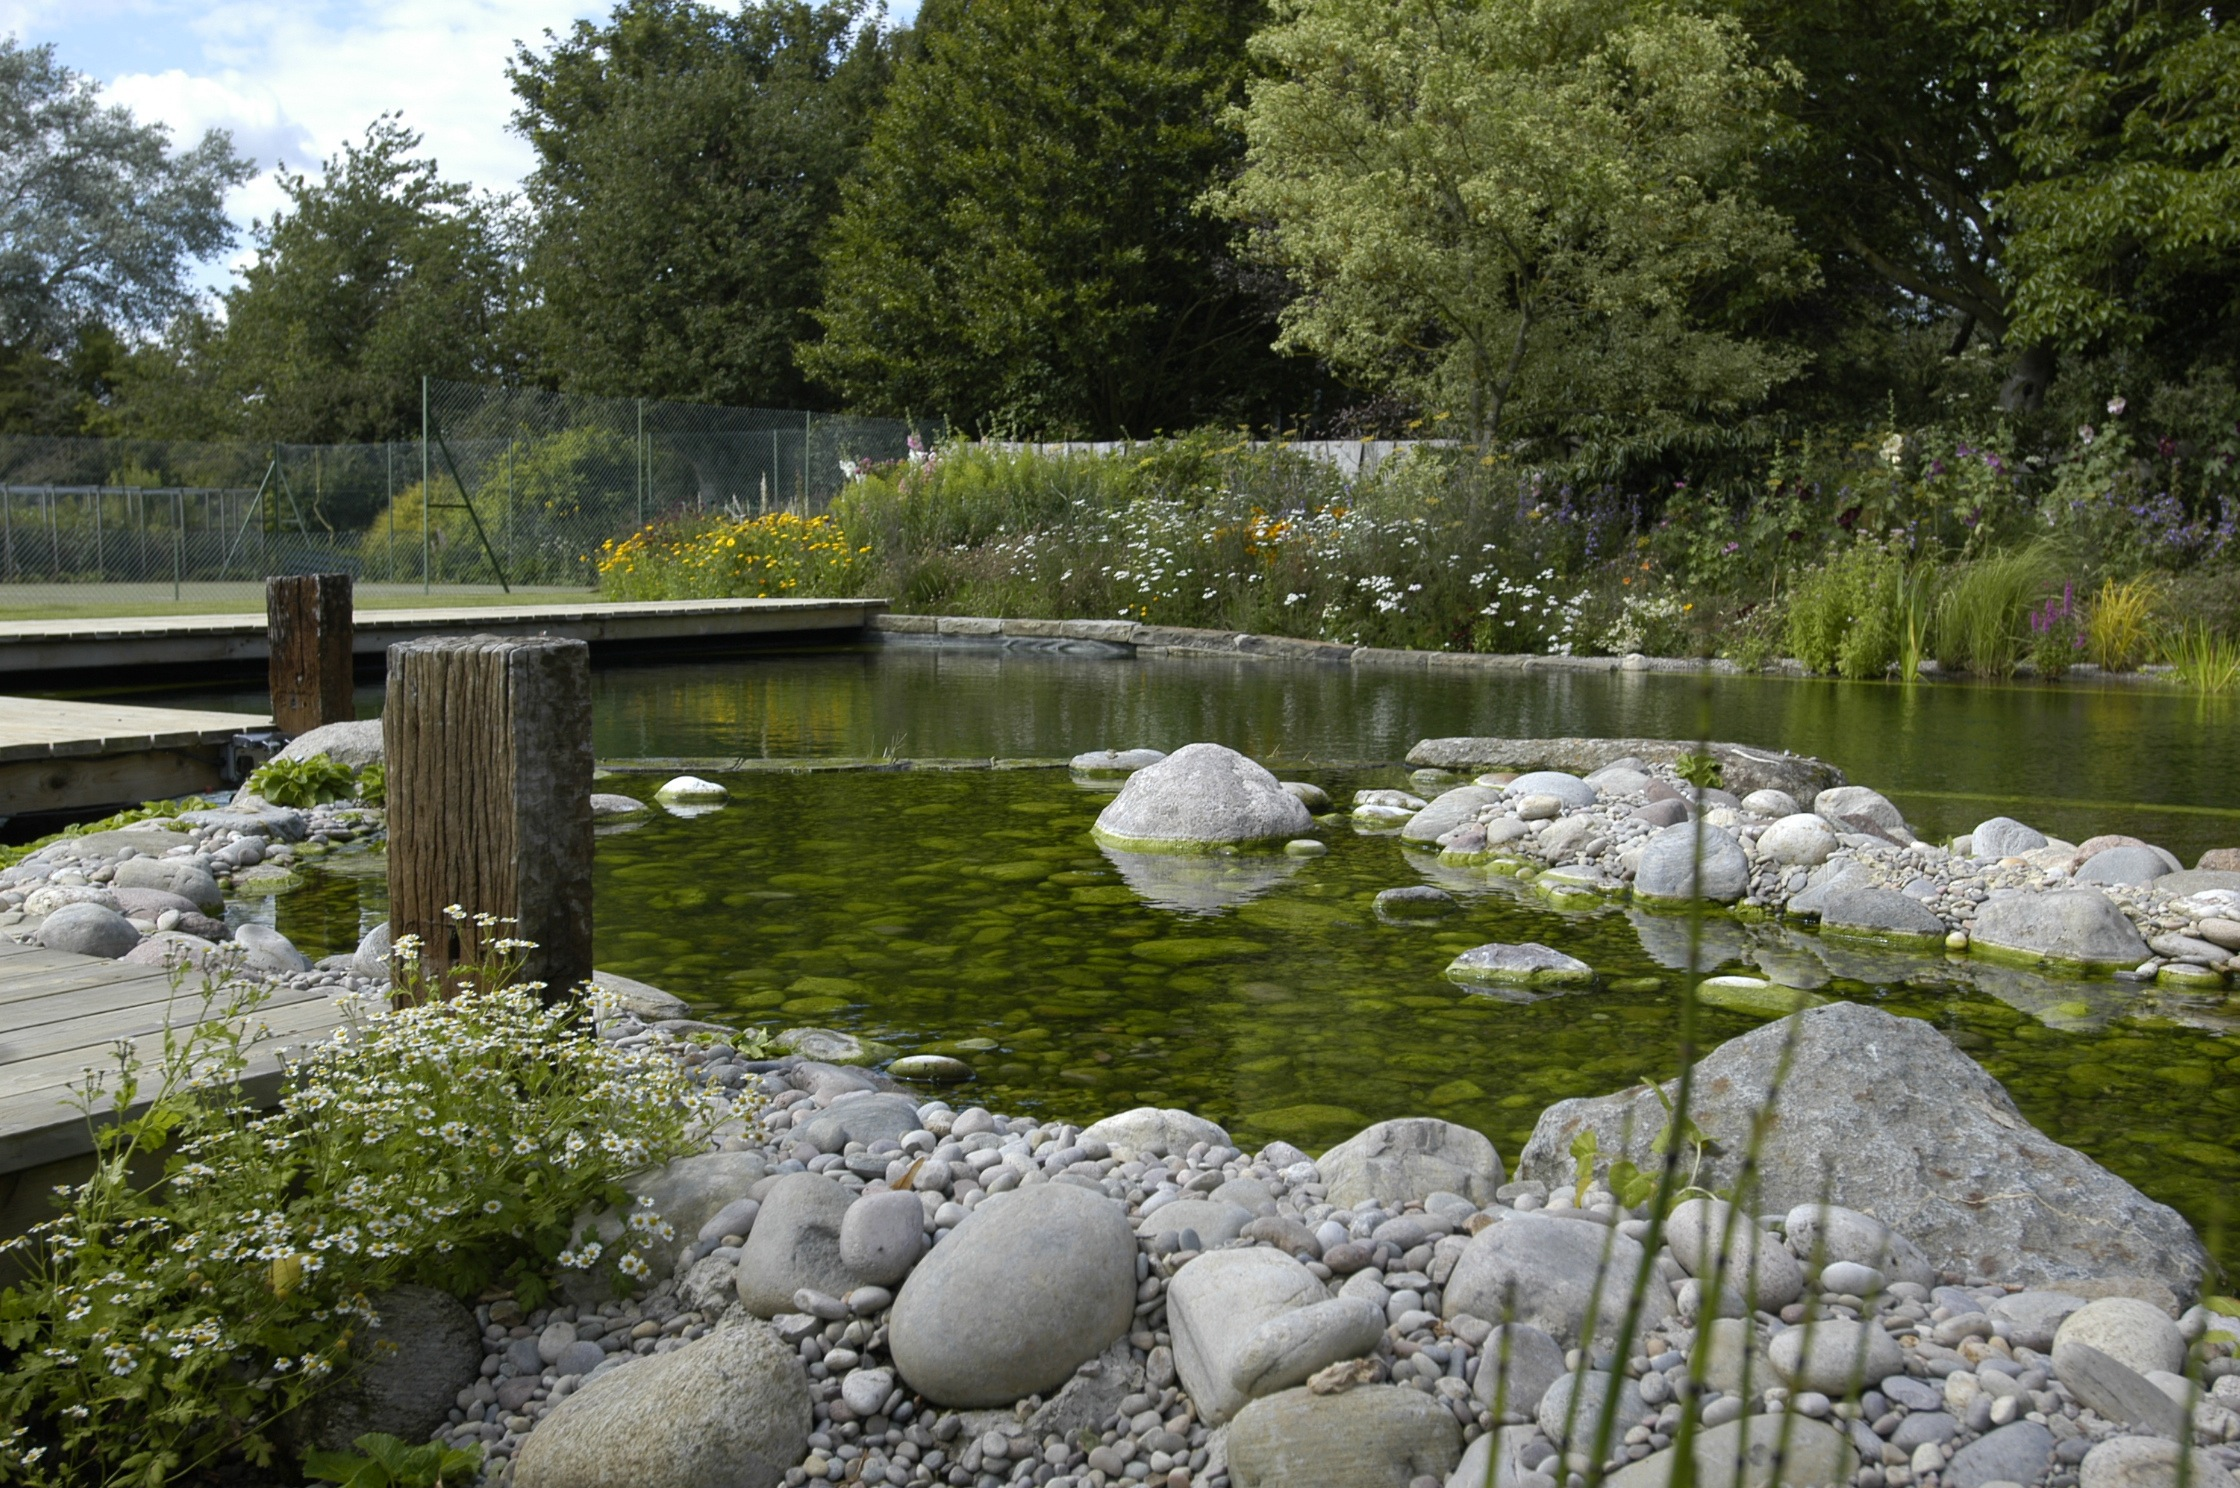 Bio swimming pools the self cleaning mini ecosystems for Pond aquatics